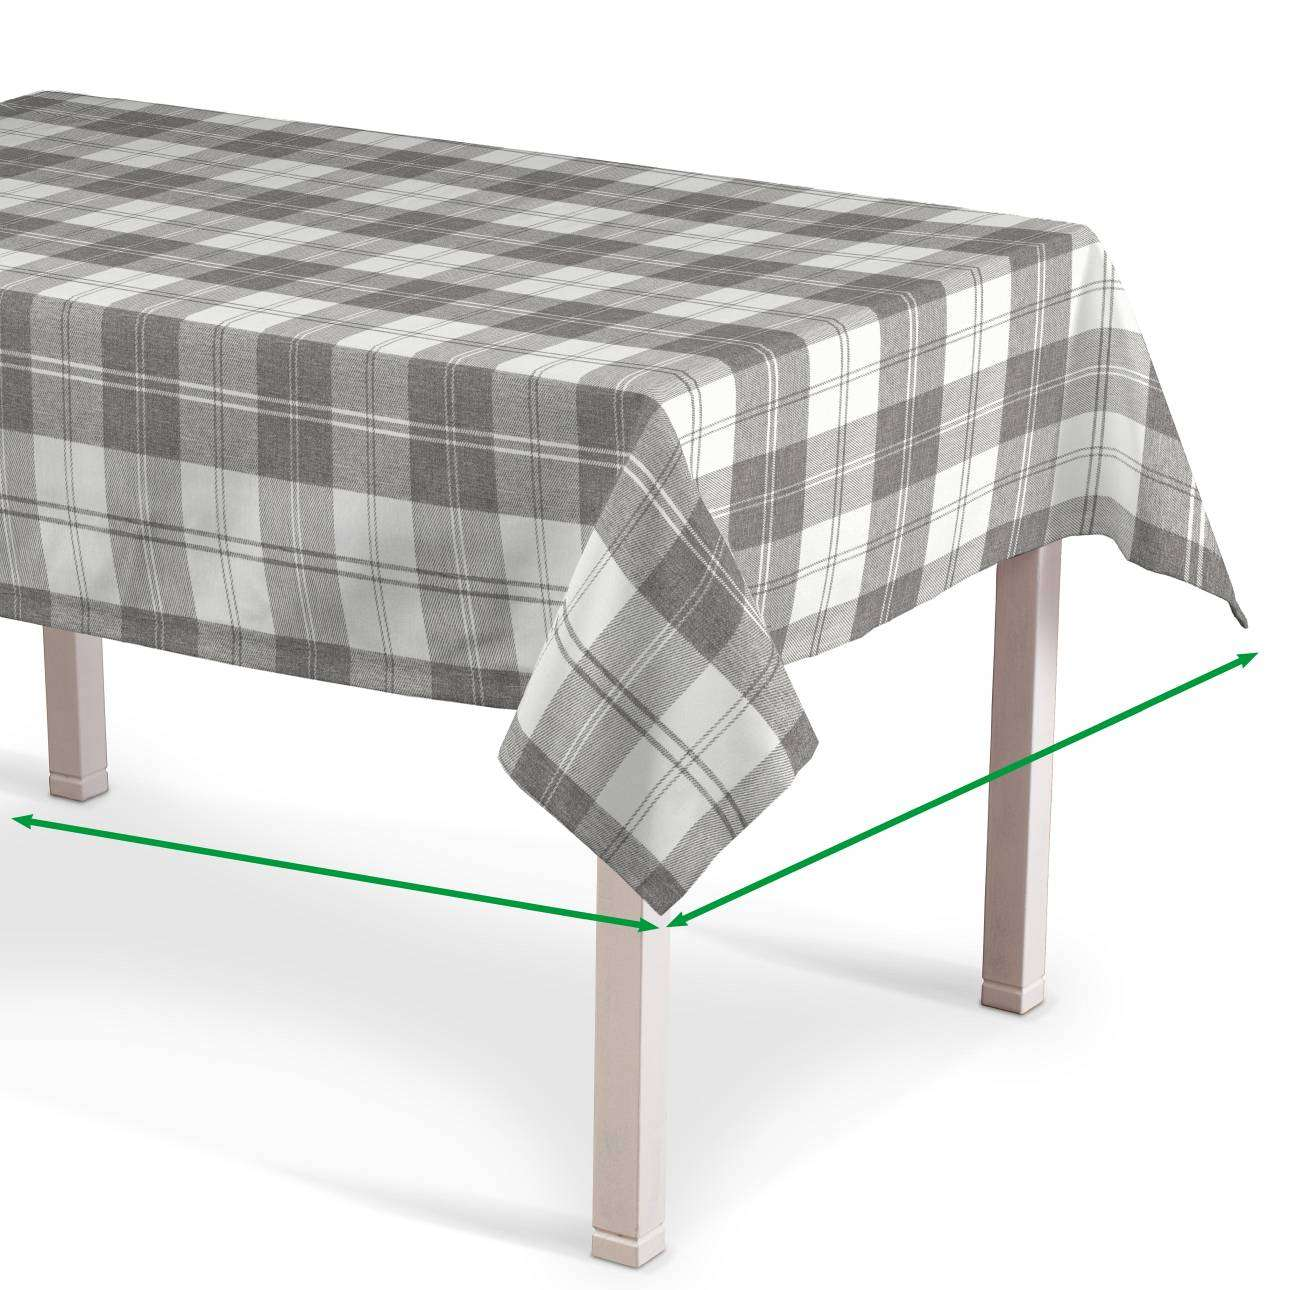 Rectangular tablecloth in collection Edinburgh, fabric: 115-79